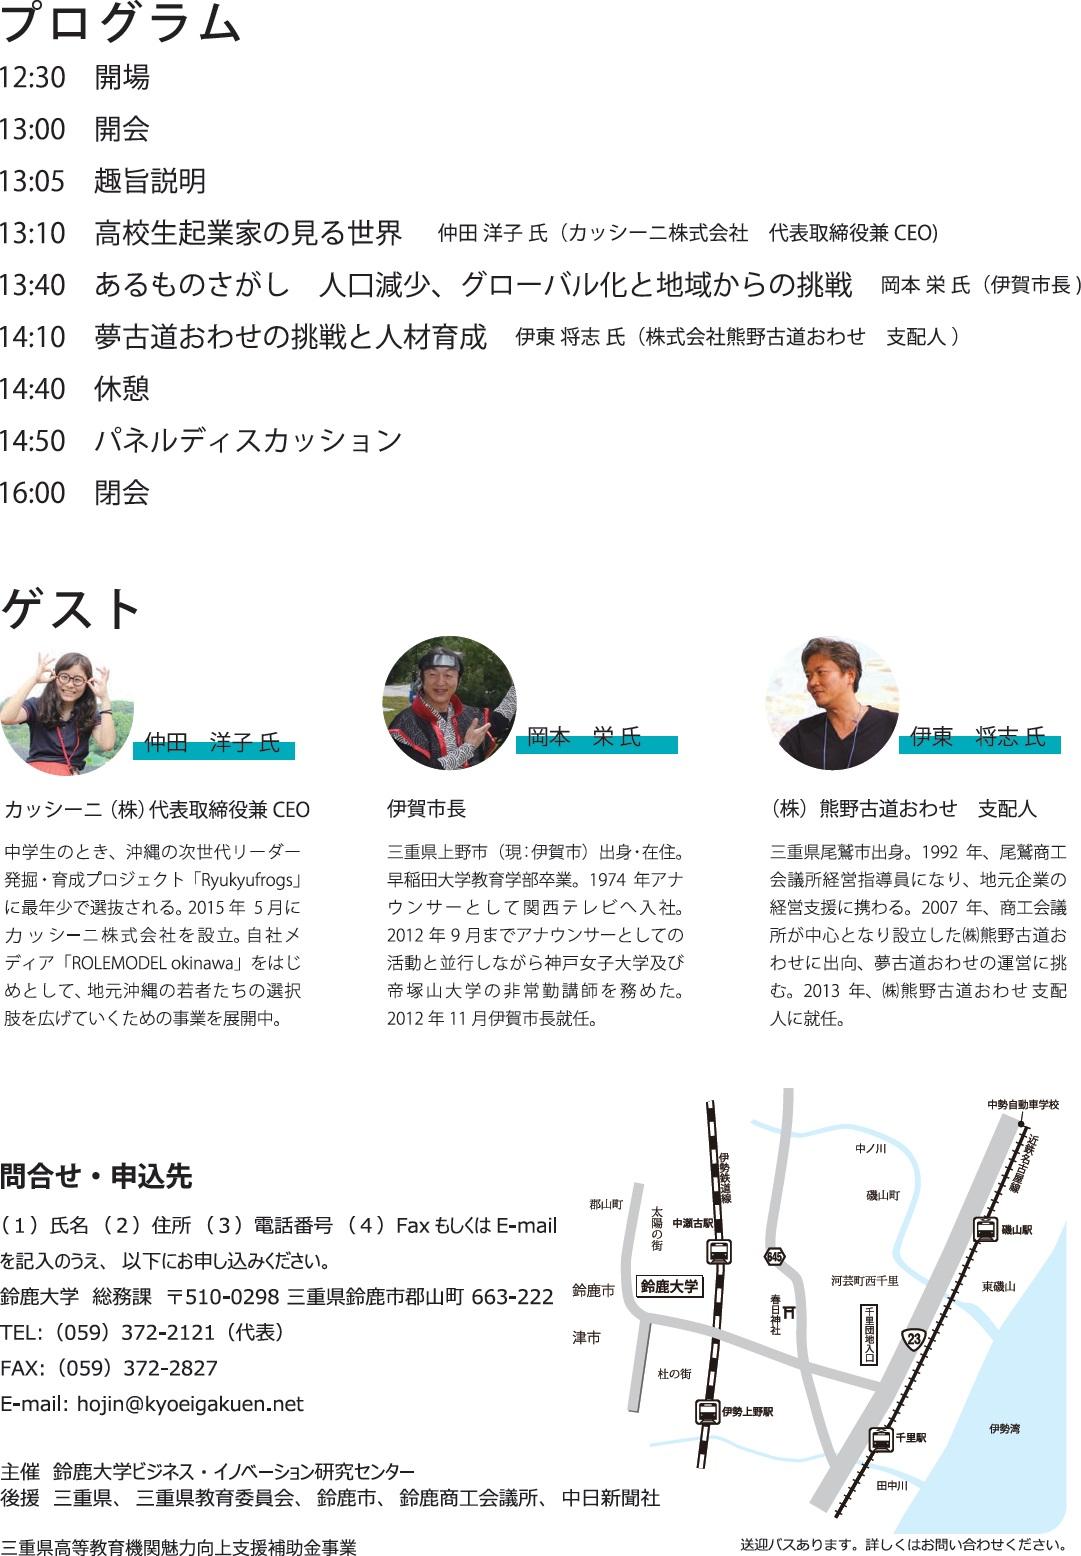 http://fmmie.jp/program/eveningcoaster/photos/%E7%84%A1%E9%A1%8C4.jpg